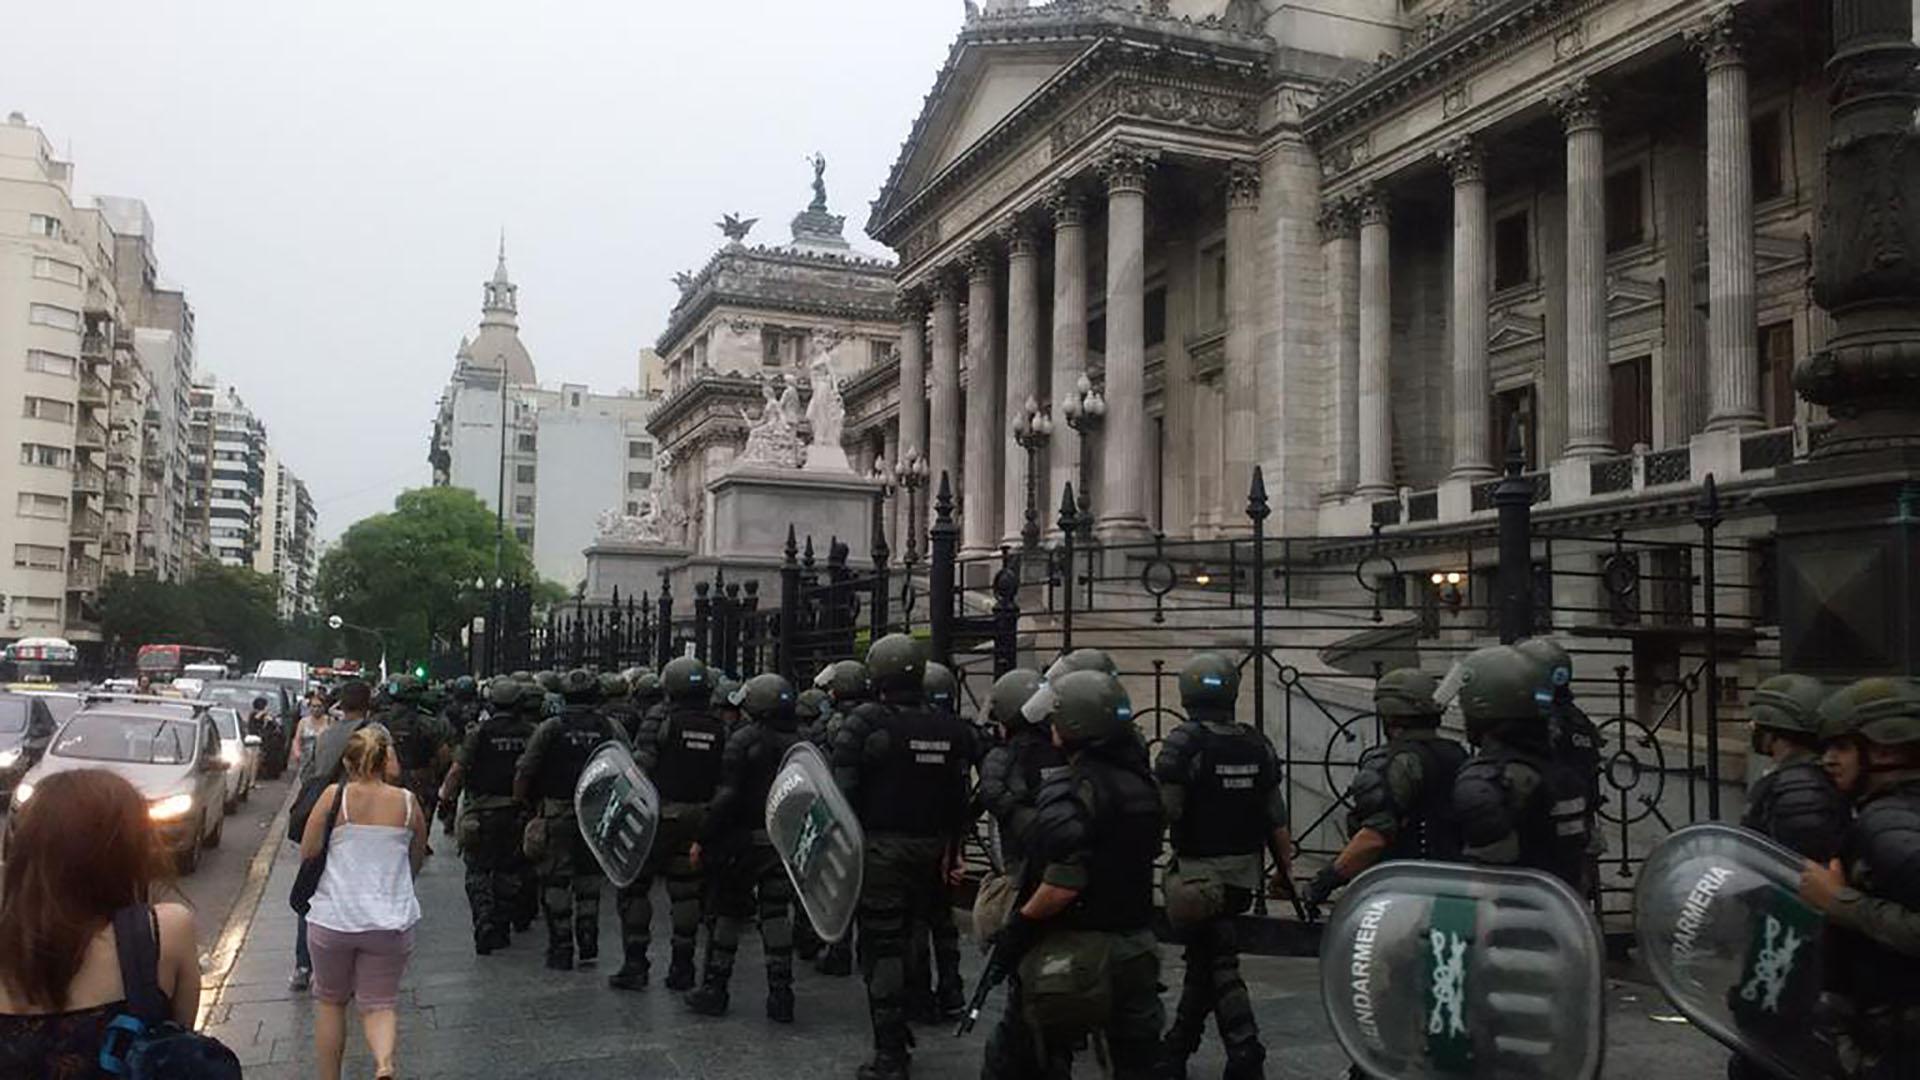 La Gendarmería se apostó frente al Congreso (@jmkarg)